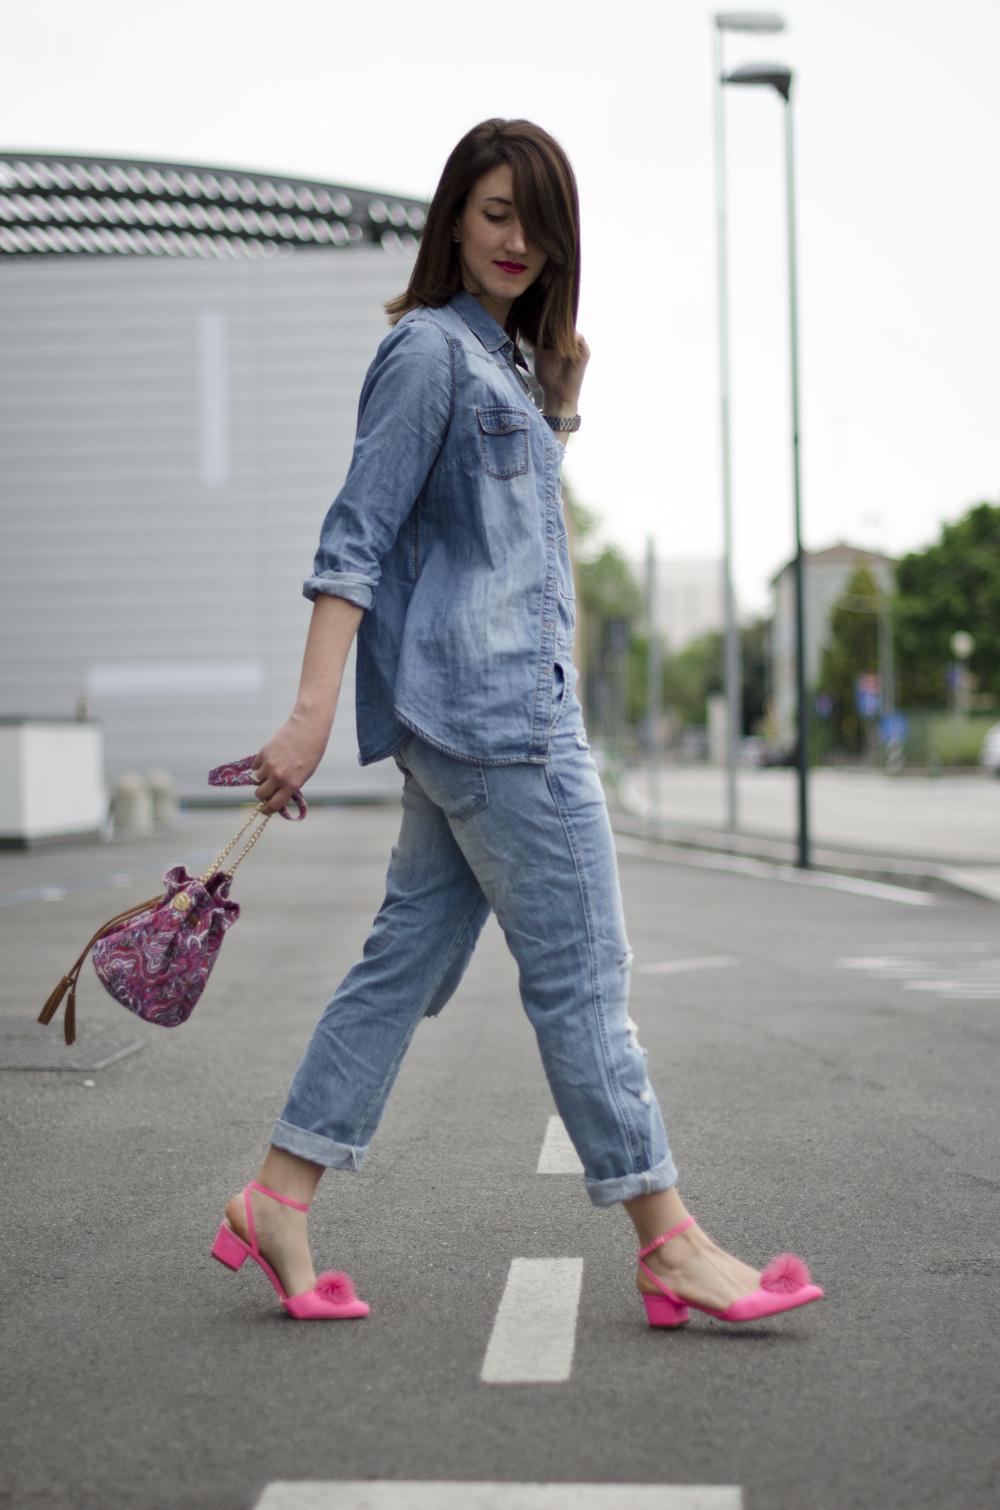 jeans look | salopette jeans | denim look